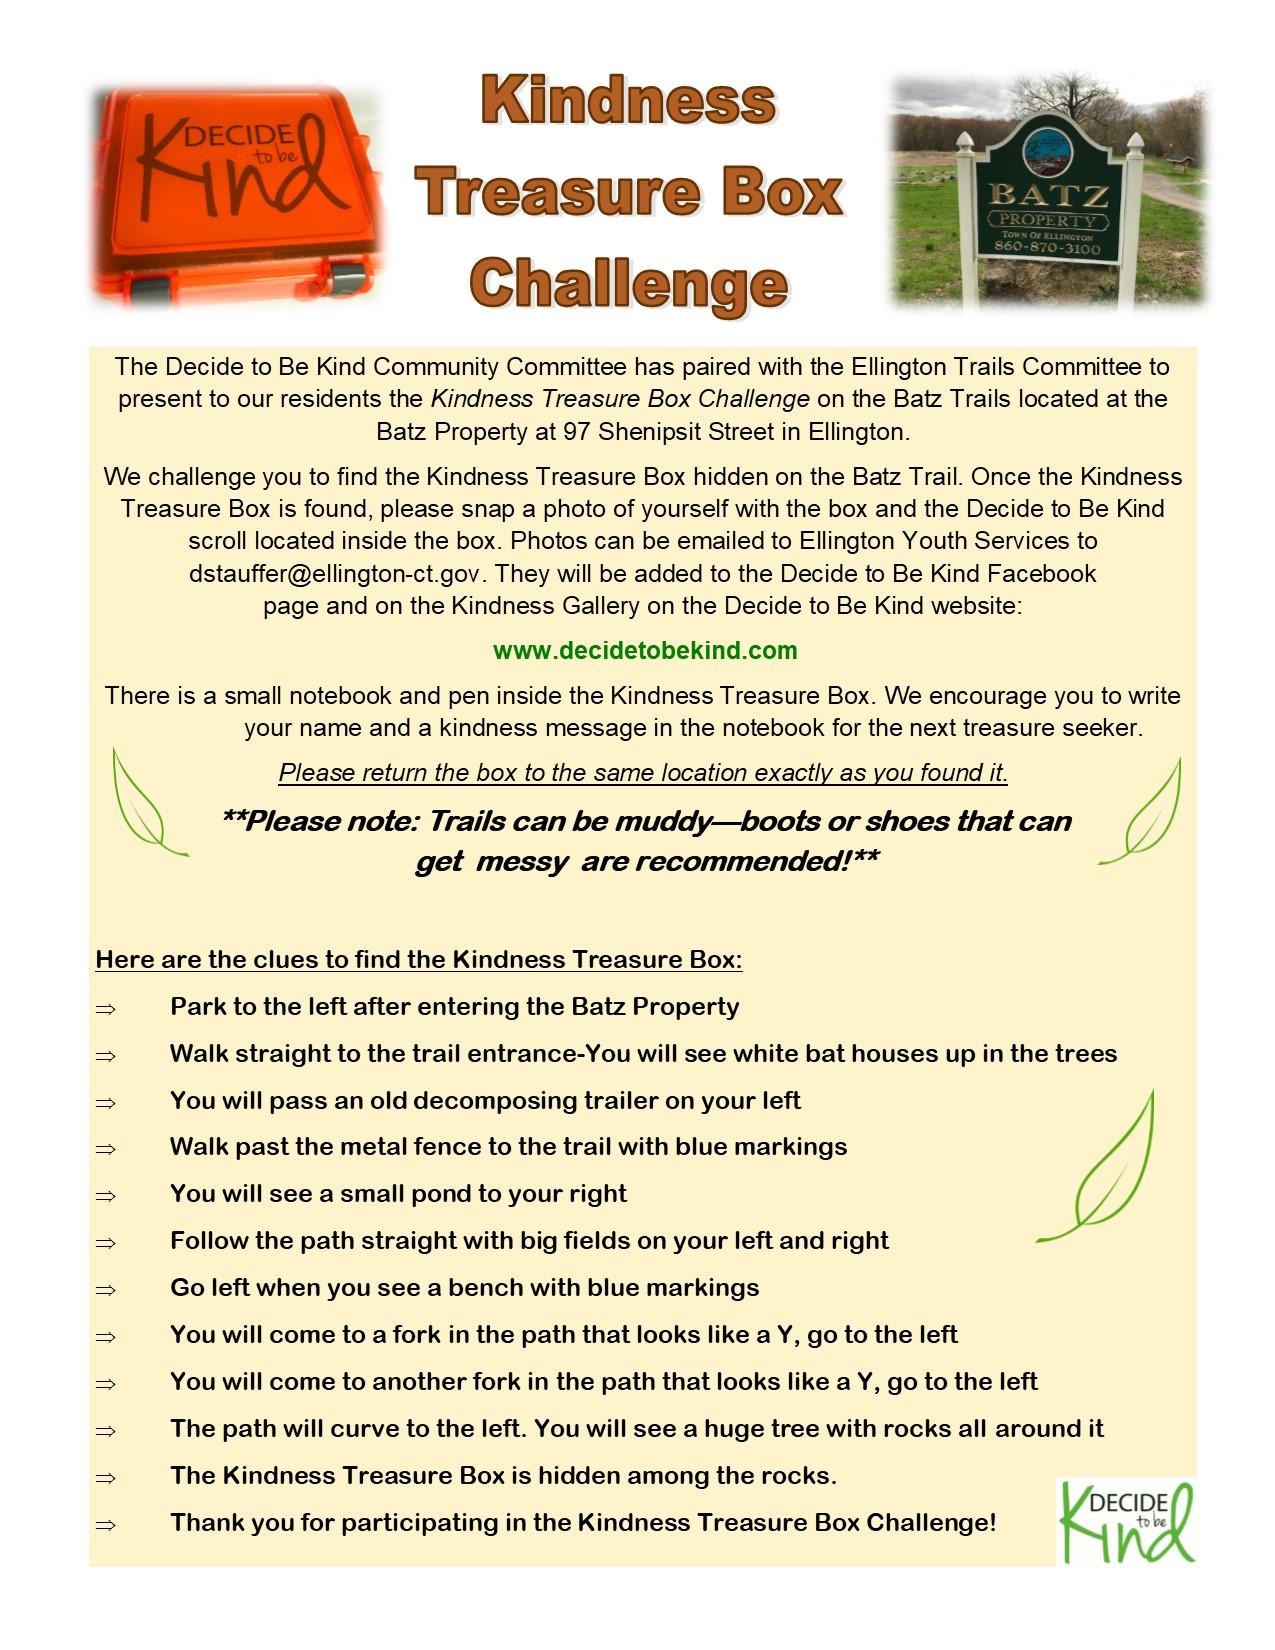 Kindness Treasure Challenge Instructions.jpg